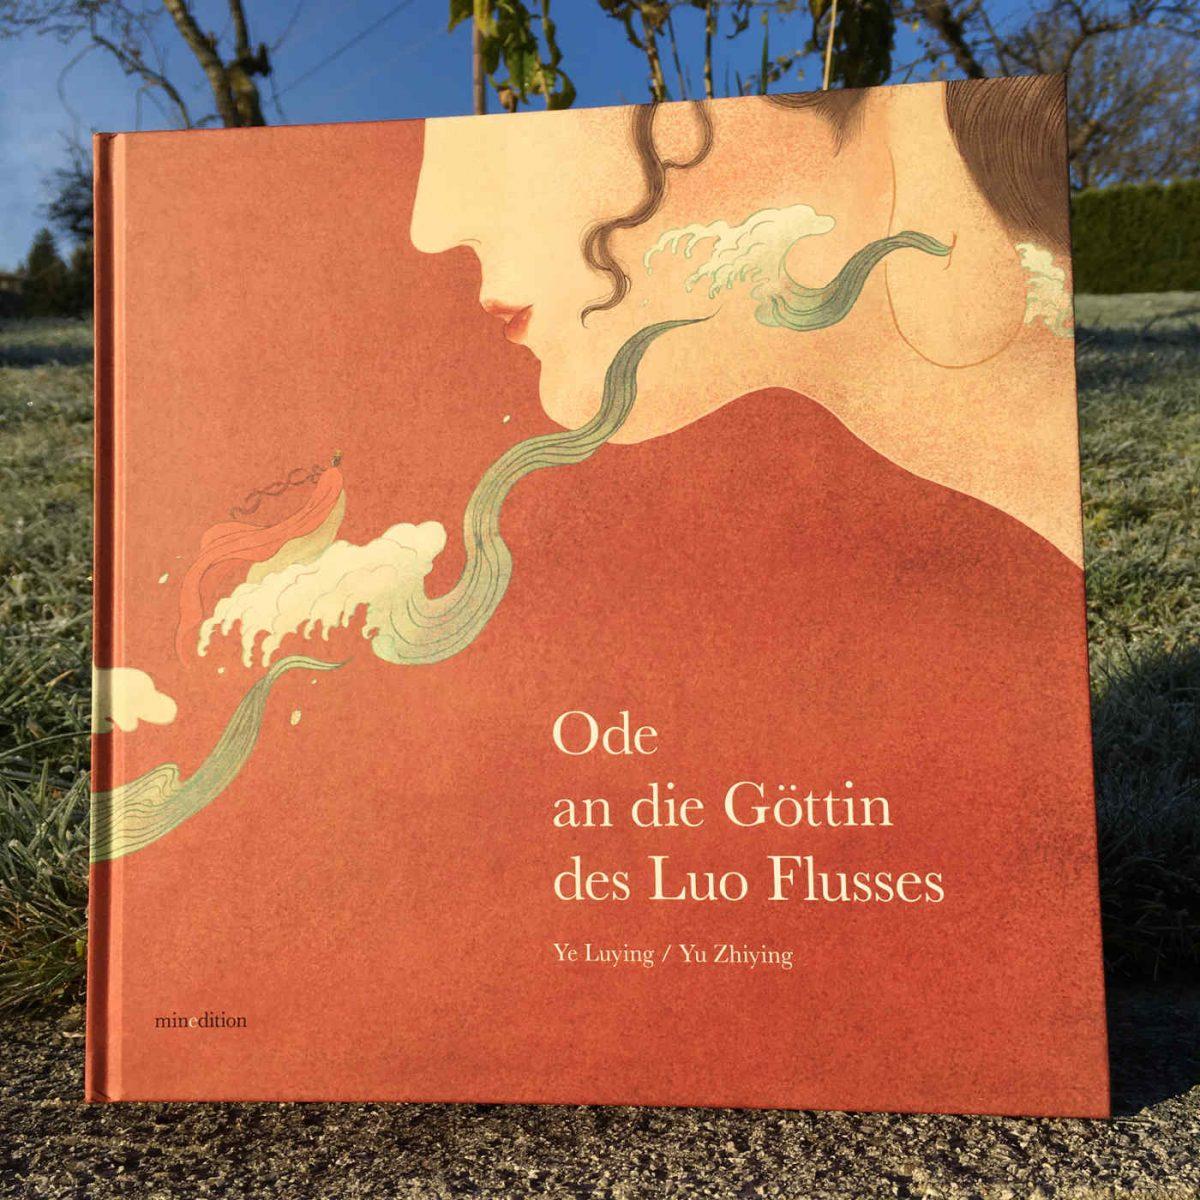 Ye Luying und Yu Zhiying : Ode an die Göttin des Luo Flusses